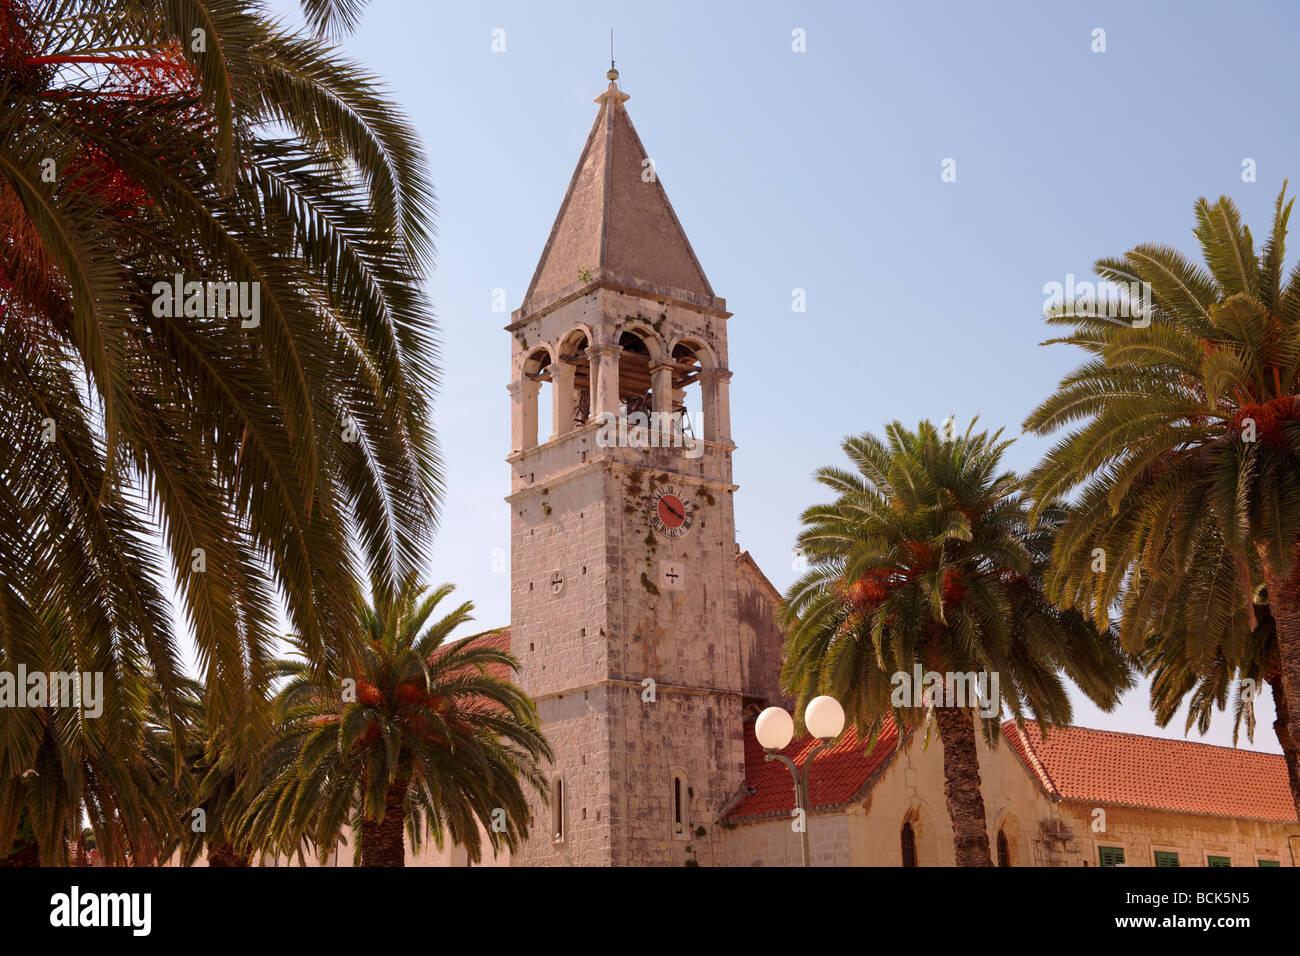 Dominican Monastery - Trogir Croatia Stock Photo